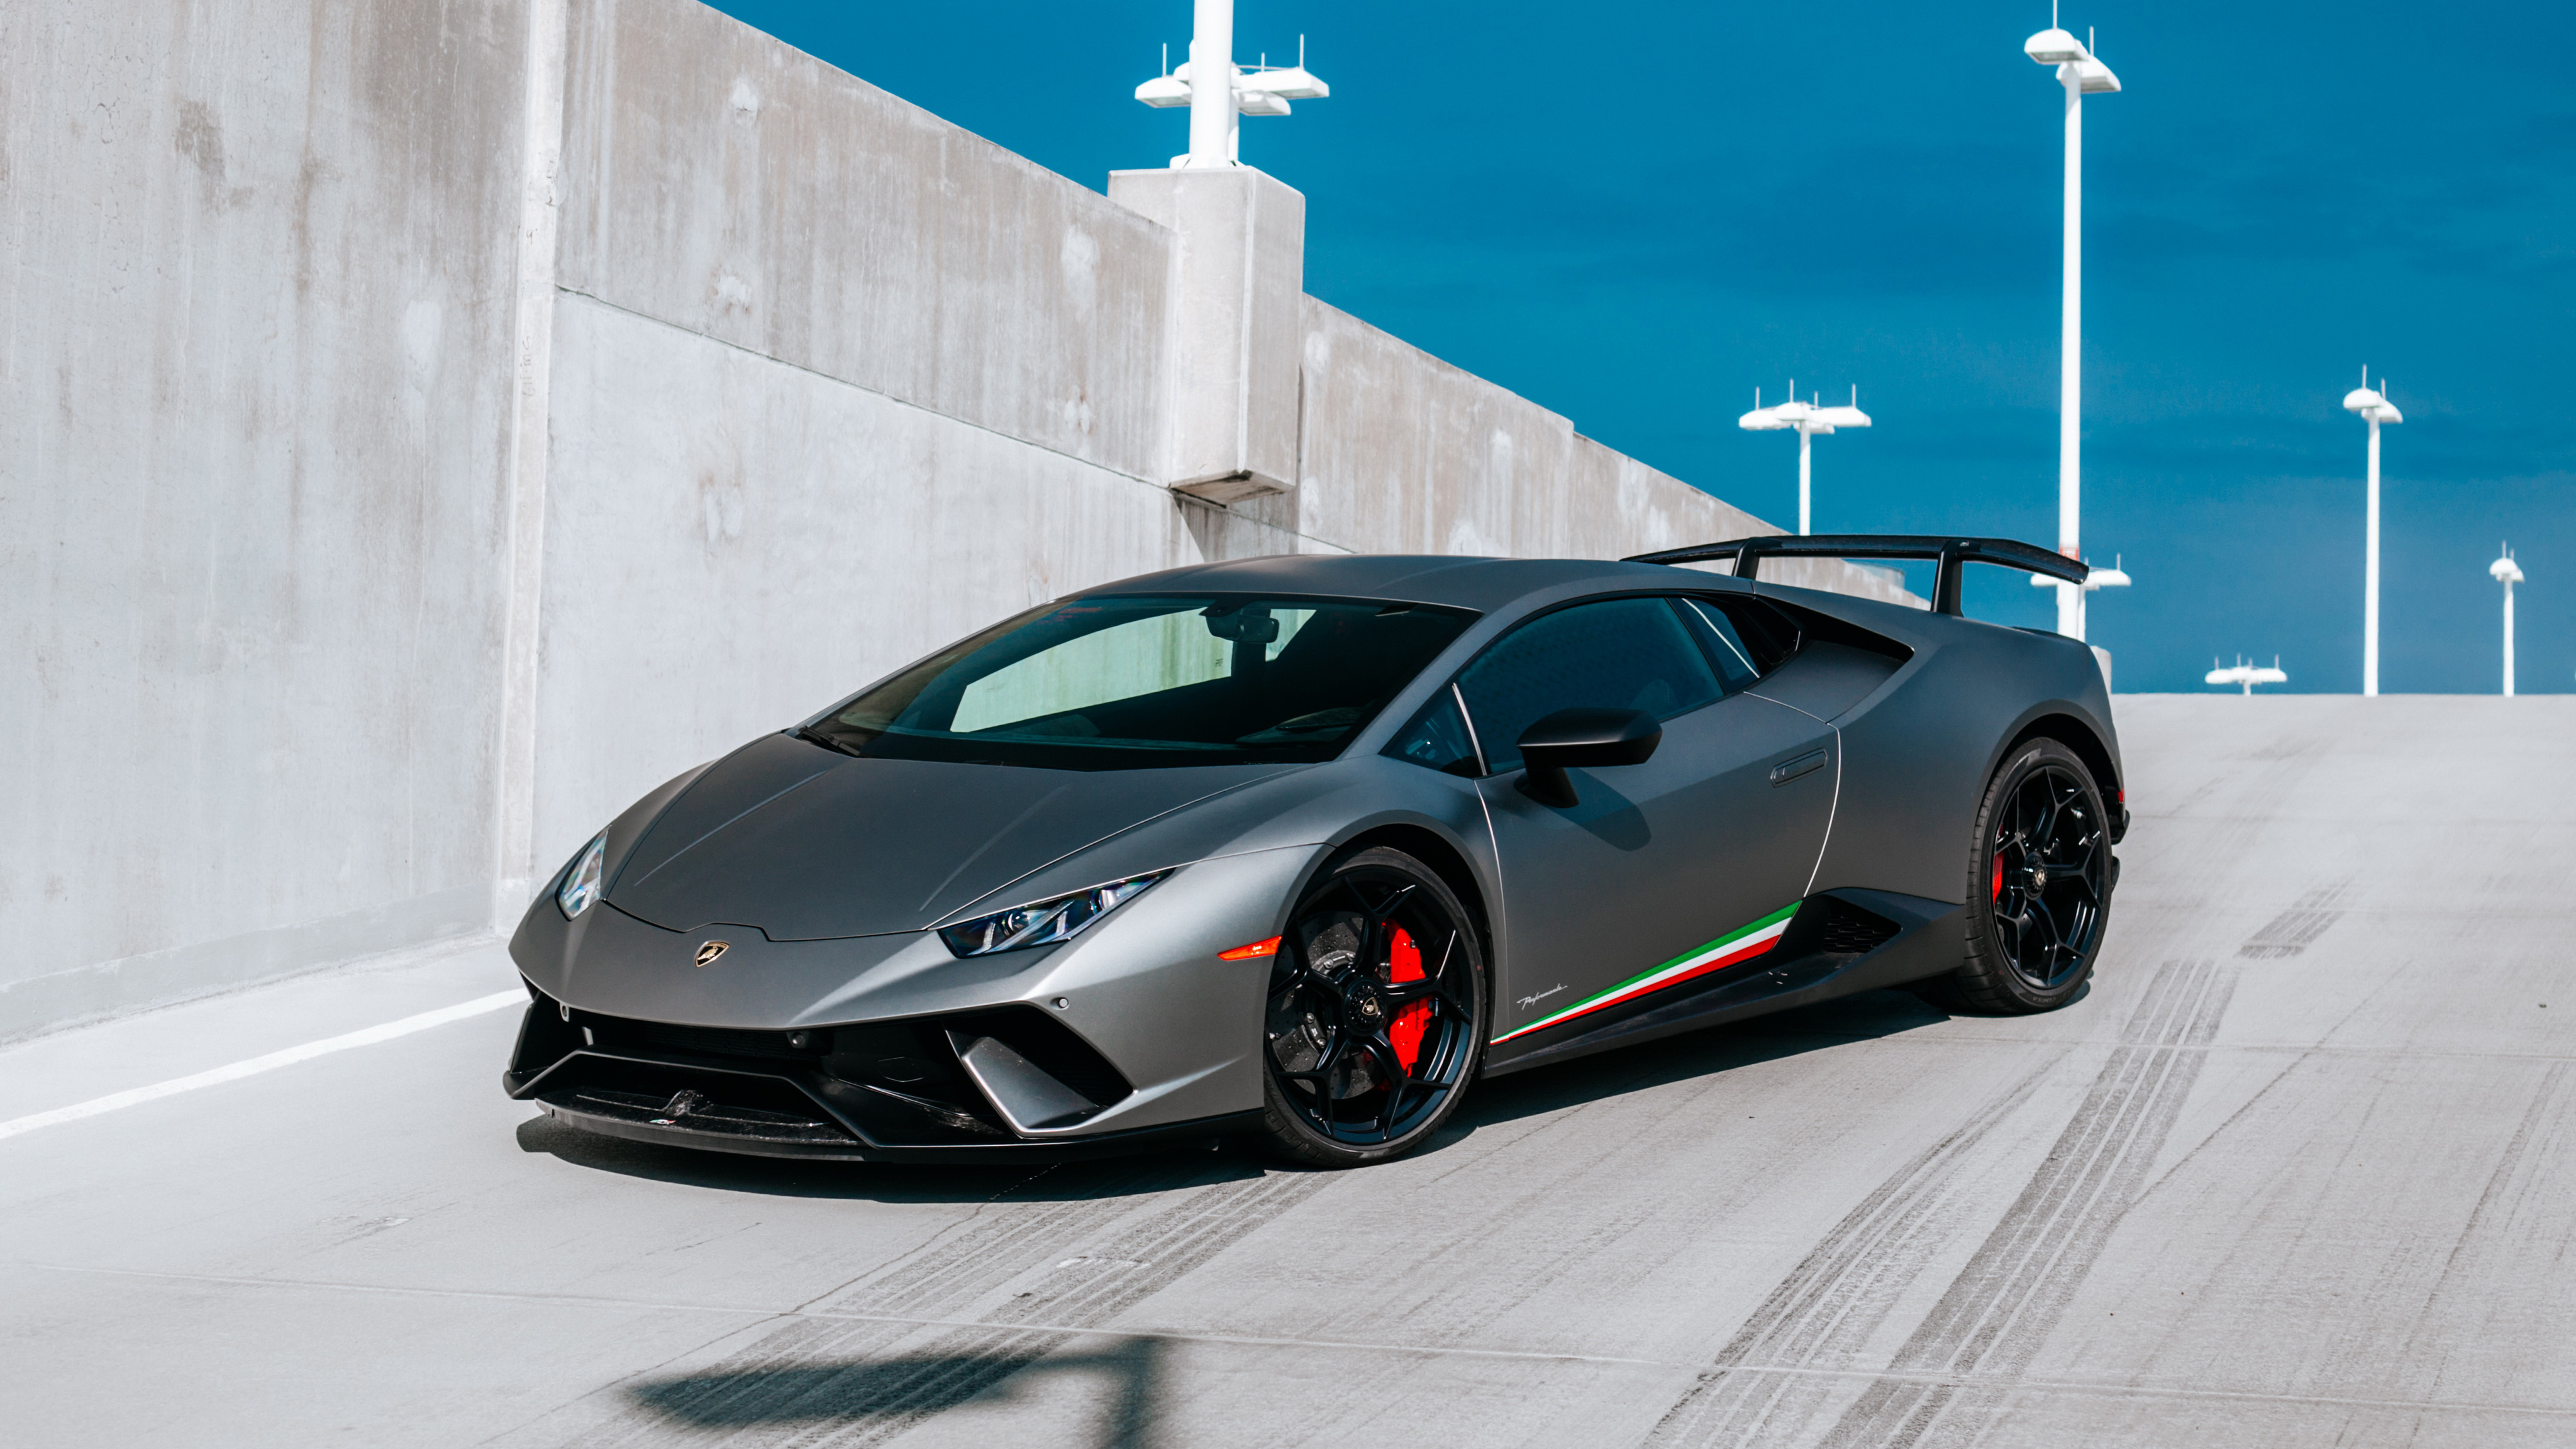 2017 Lamborghini Huracan Performante 4K 2